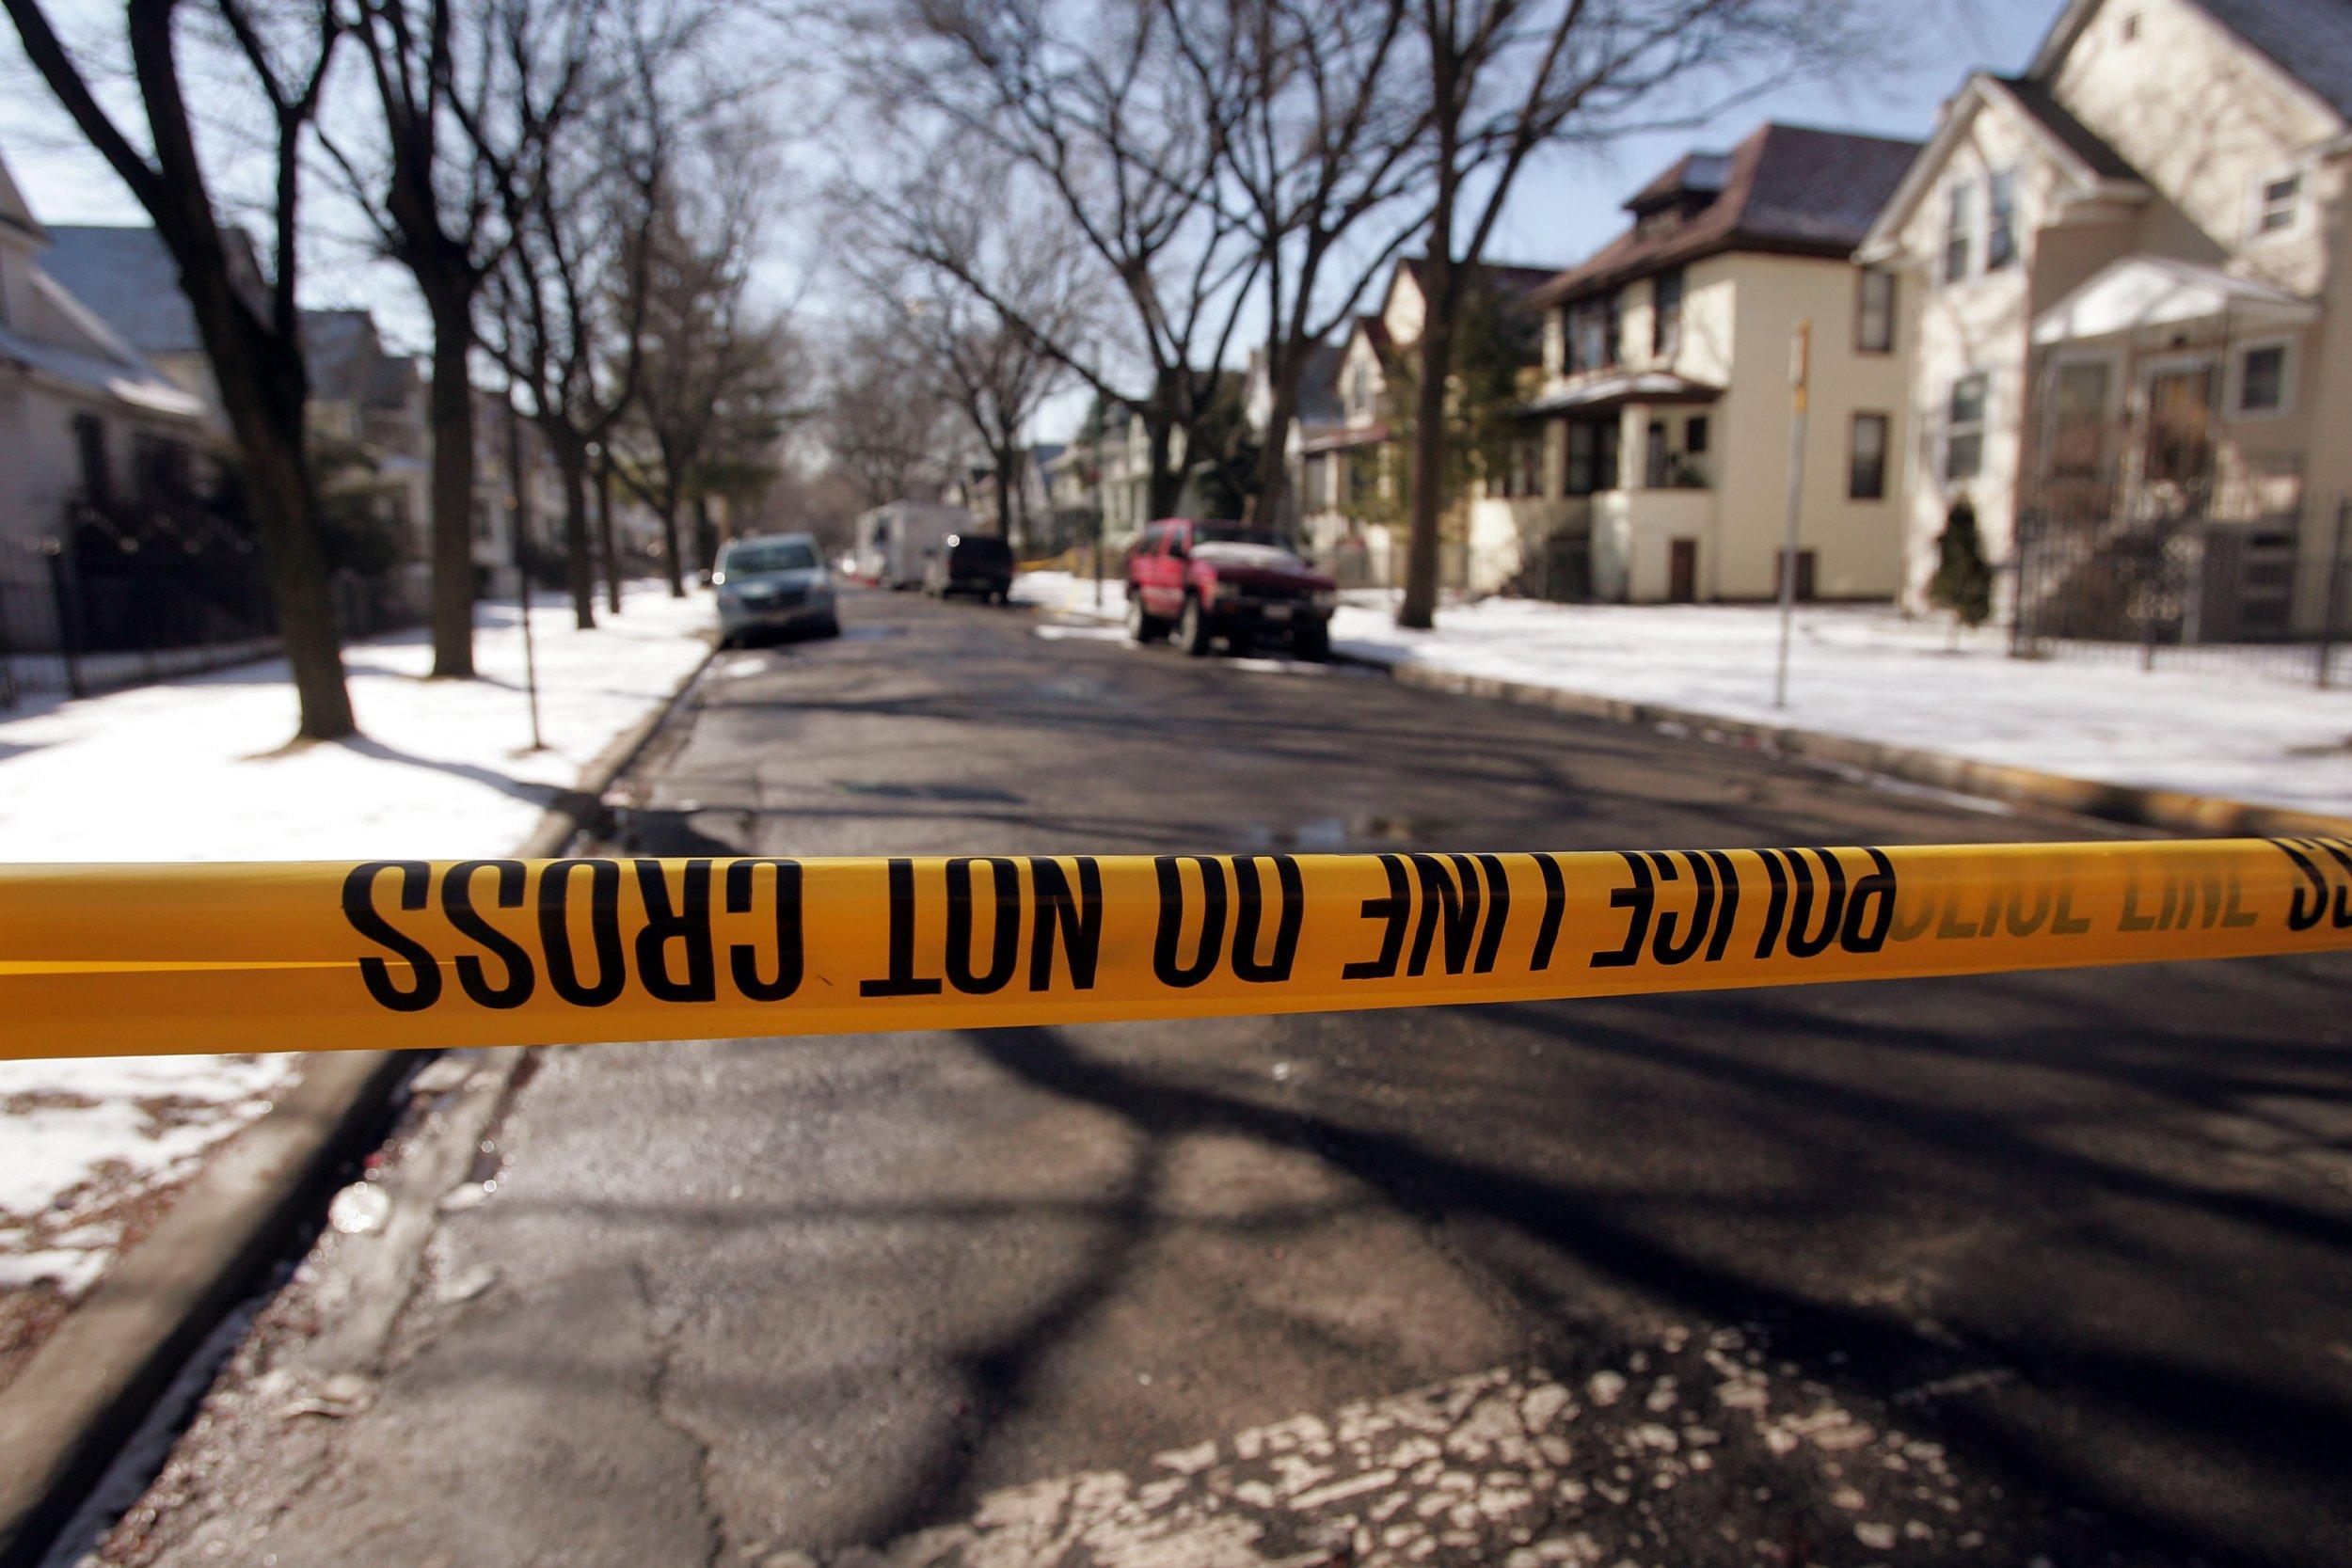 Allegedly Drunk Chicago Woman S Body Found In Hotel Freezer As